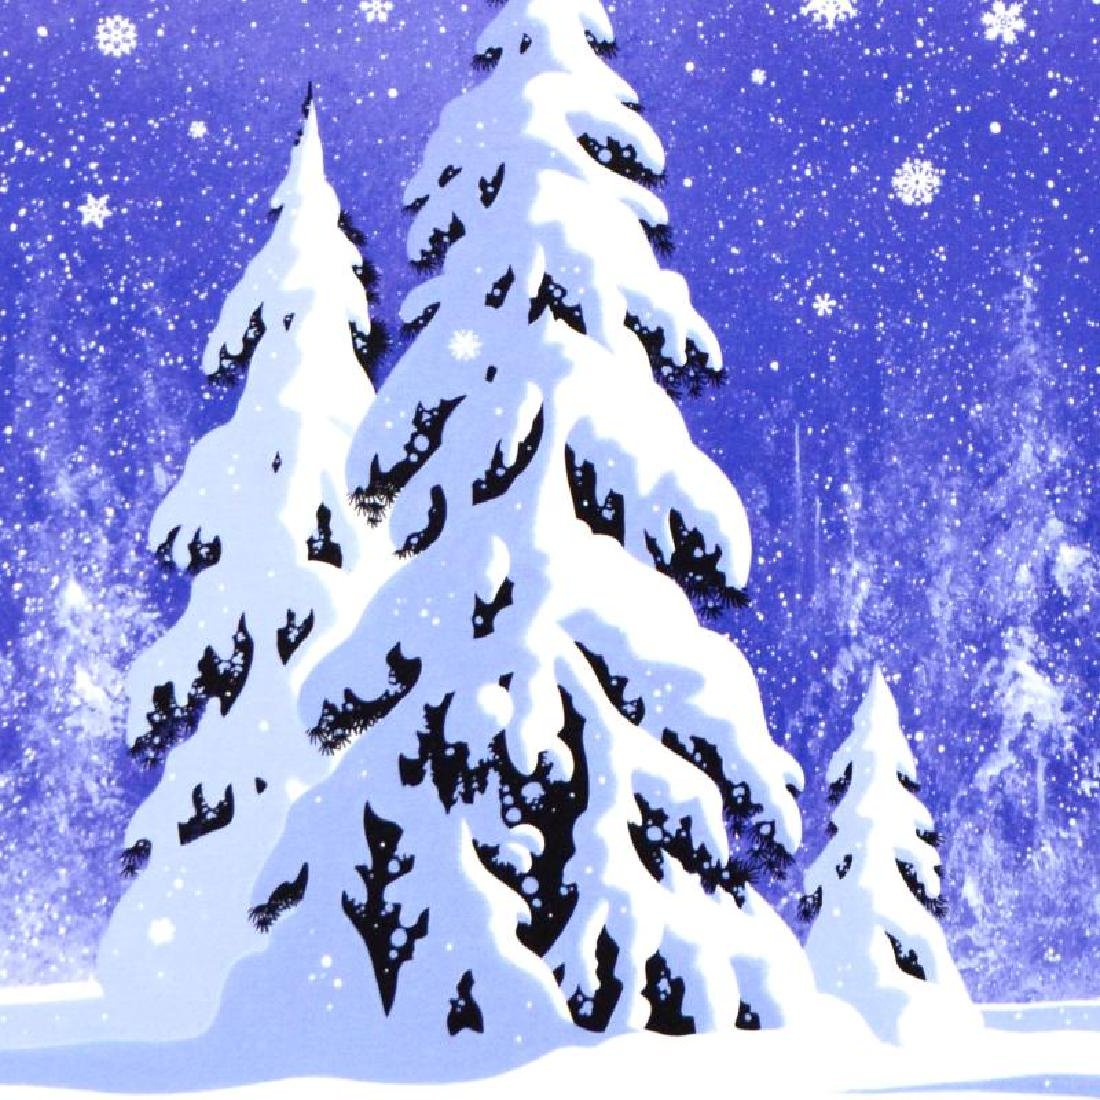 December by Rattenbury, Jon - 2